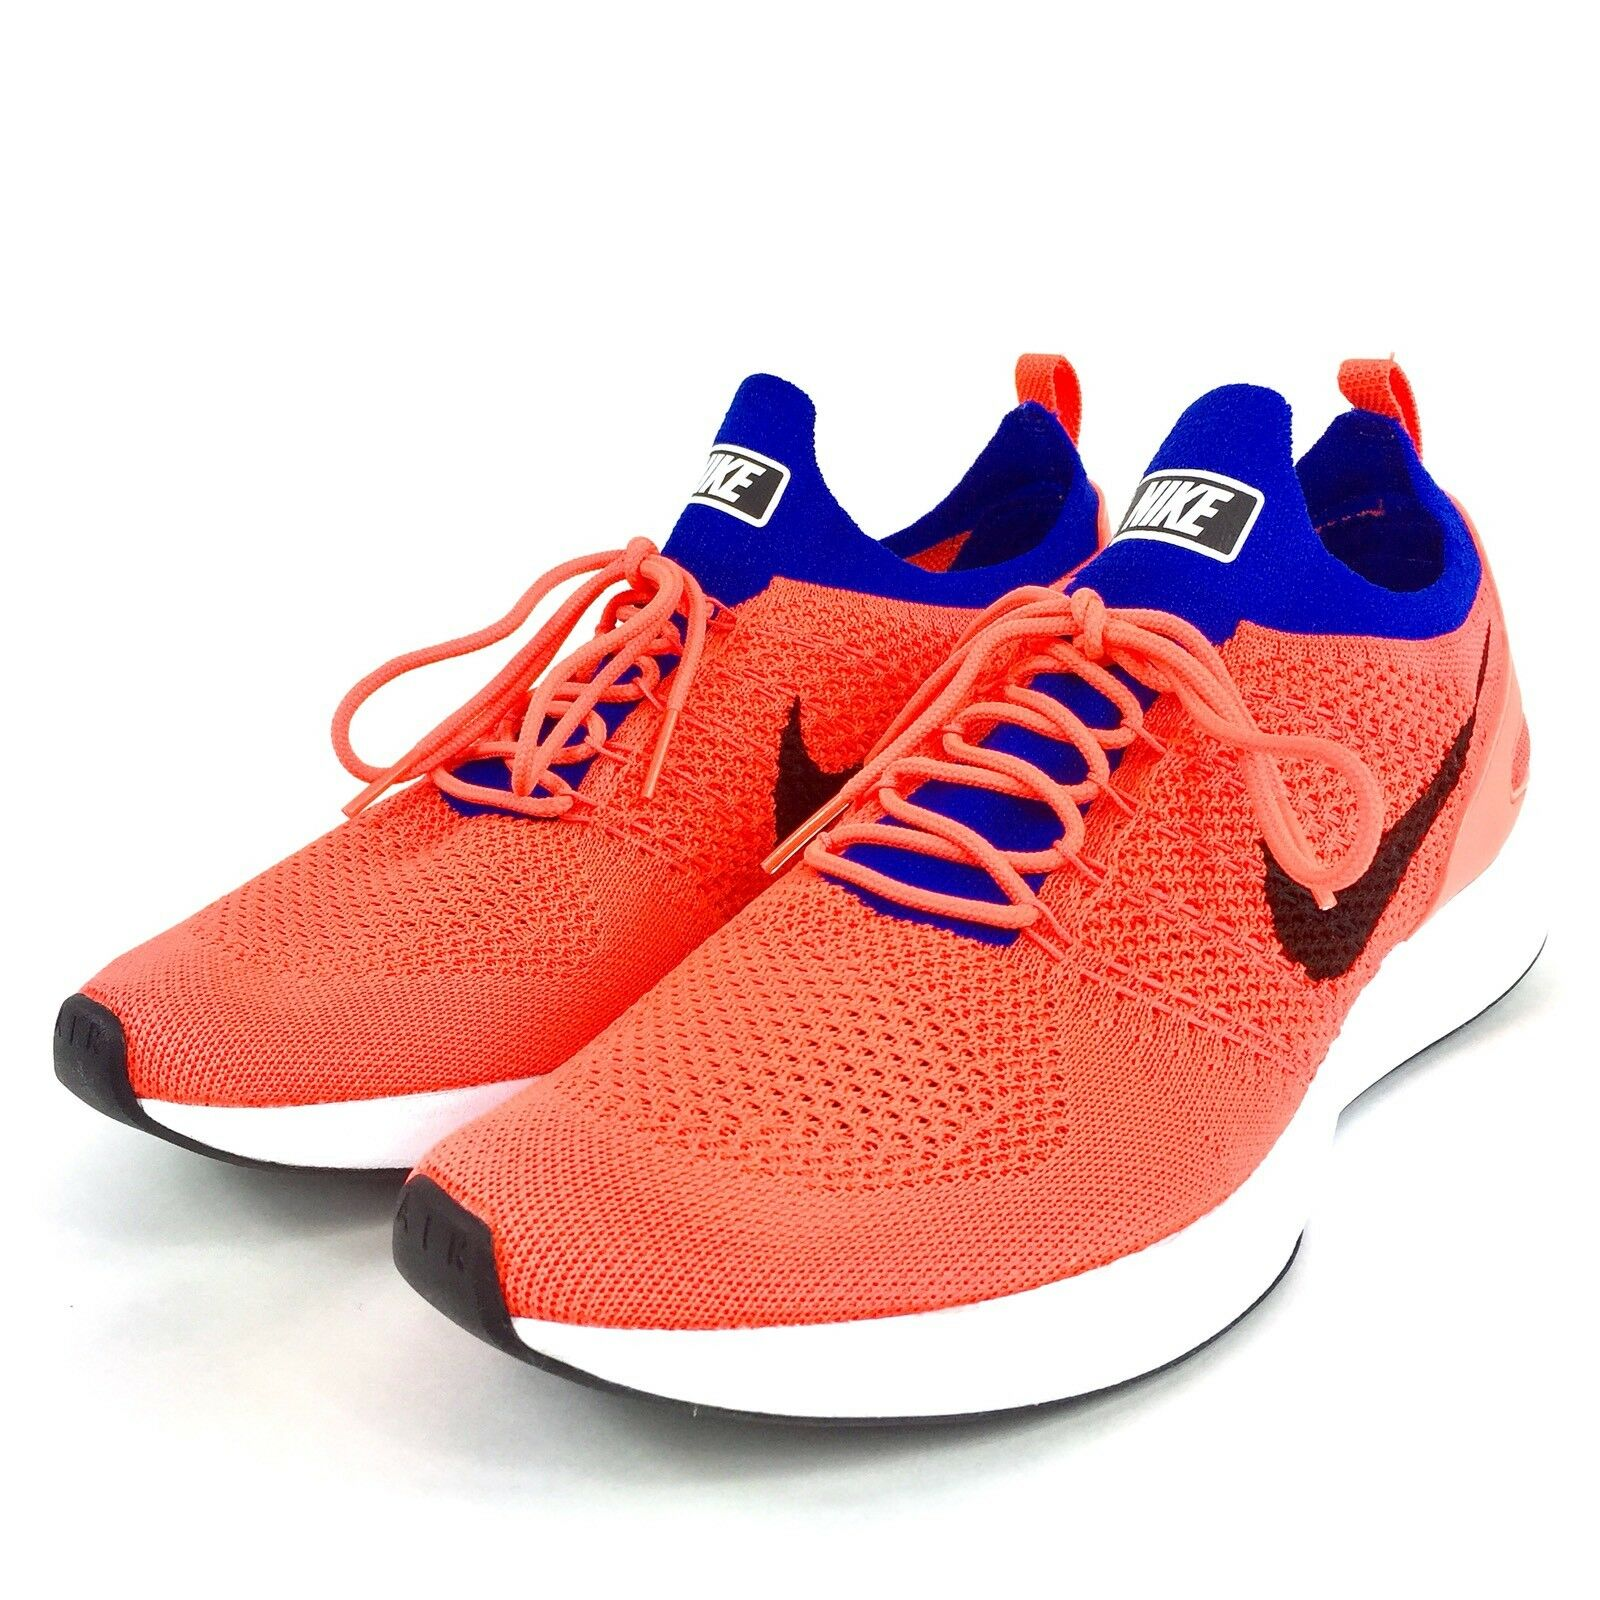 Nike Air Zoom Mariah Flyknit Racer orange Mens Running shoes 918264 800 Sz 10